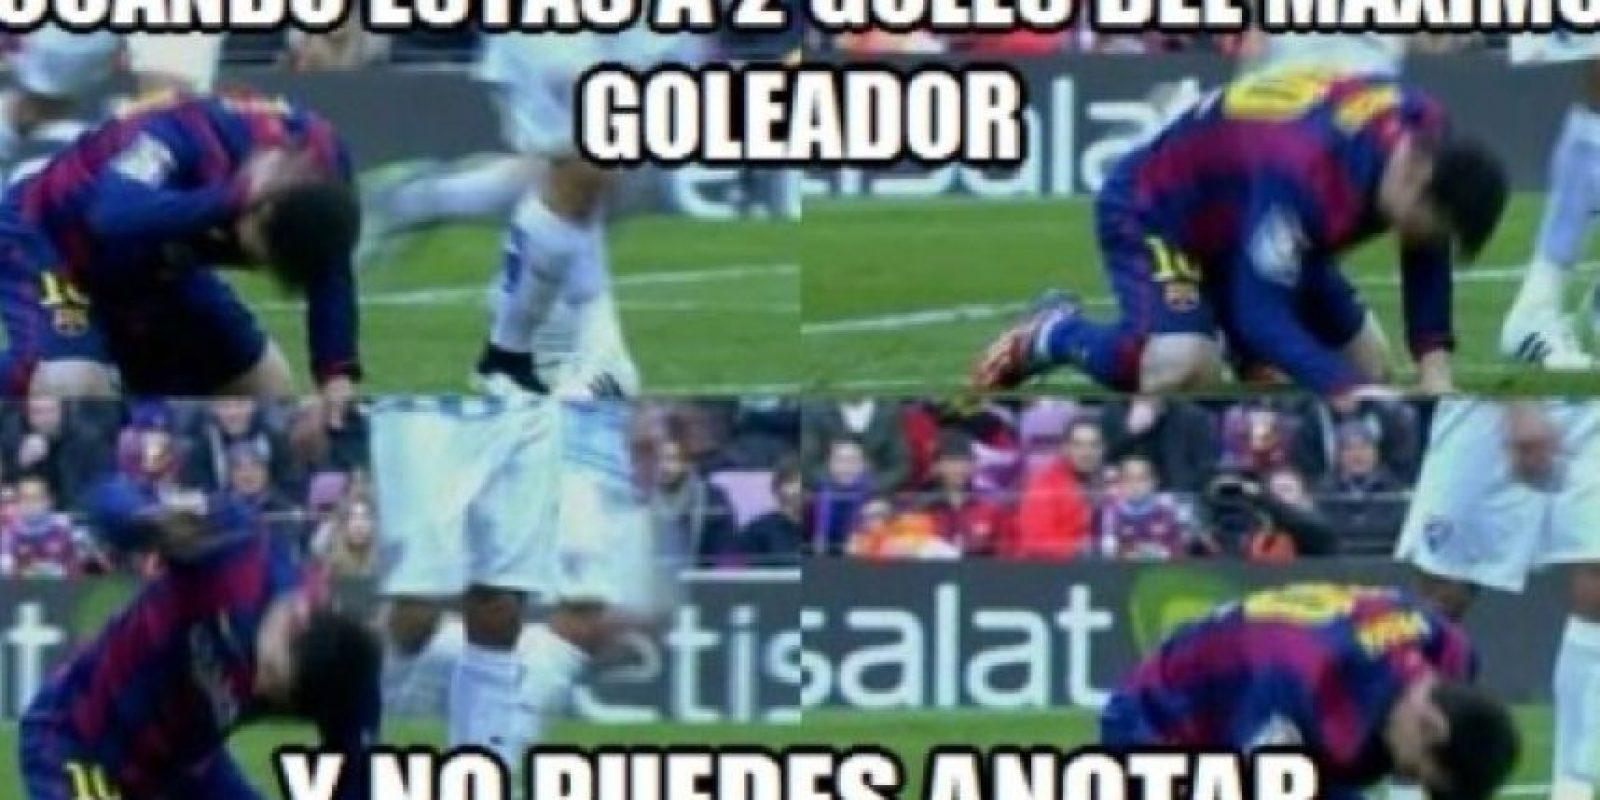 El berrinche de Messi no pasó inadvertido. Foto:Twitter